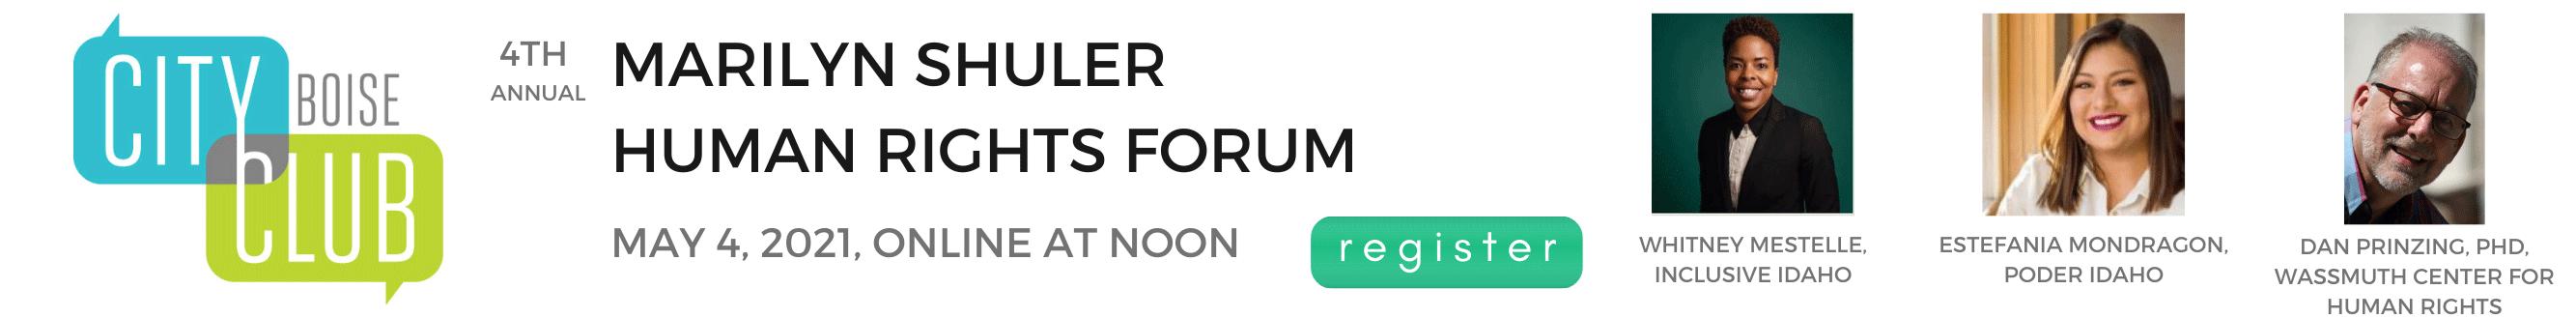 Marilyn Shuler Human Rights Forum